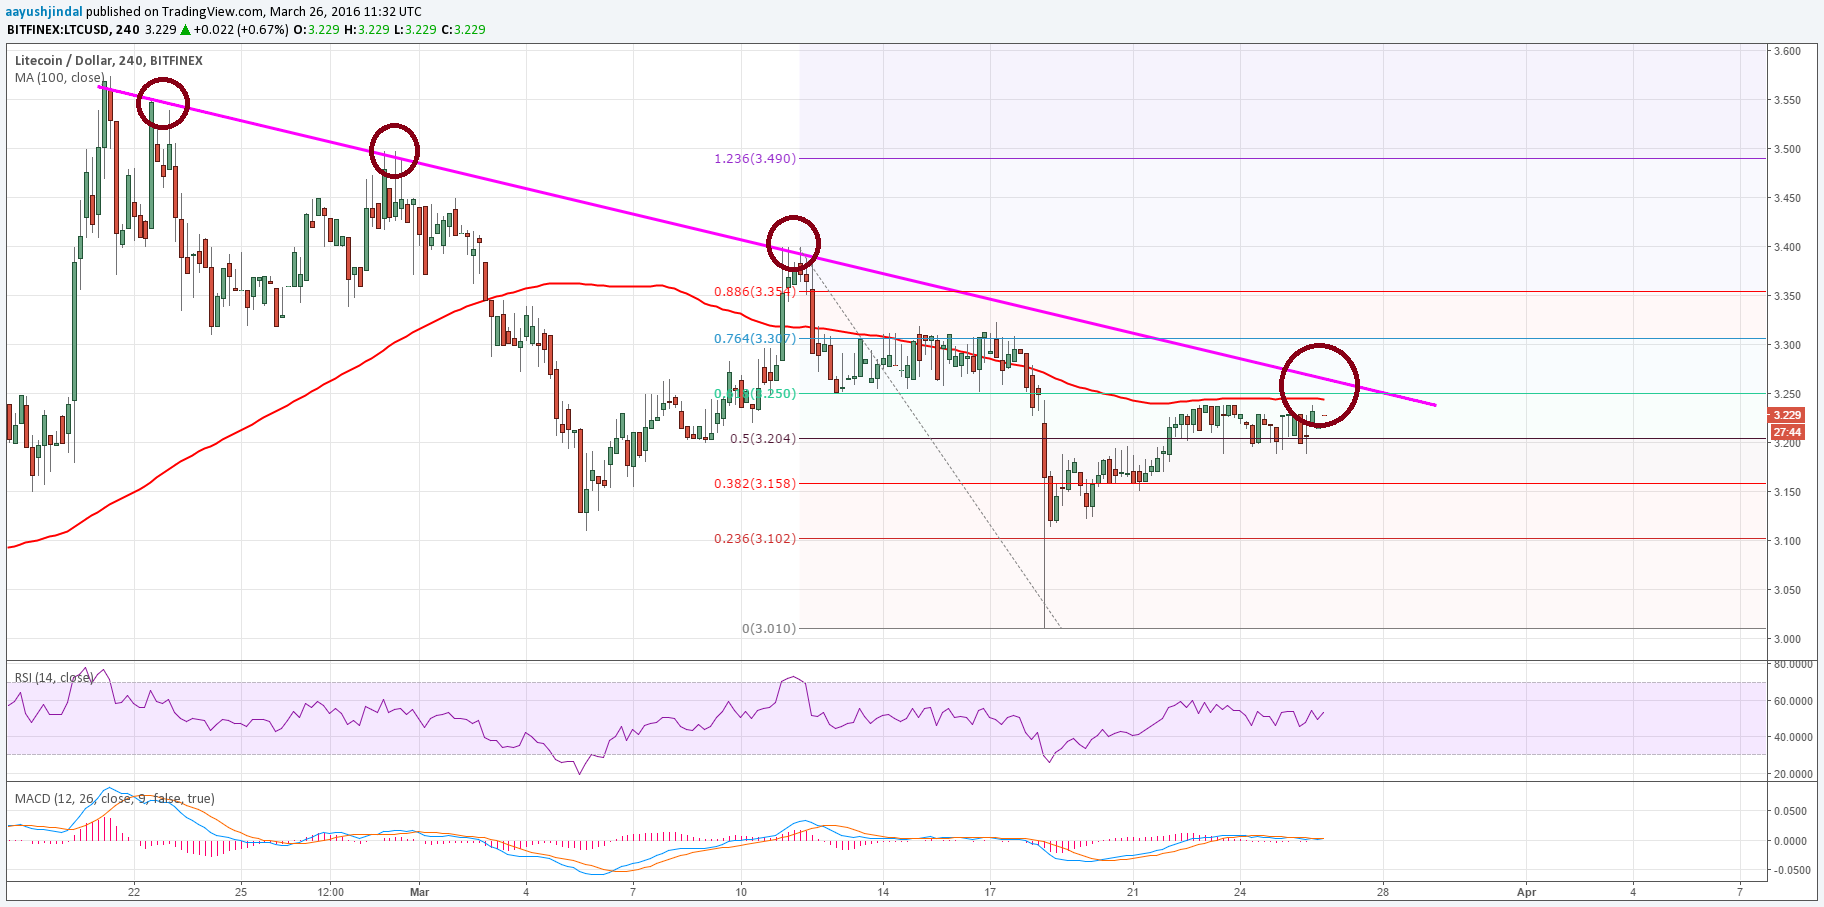 Litecoin Price Weekly Analysis